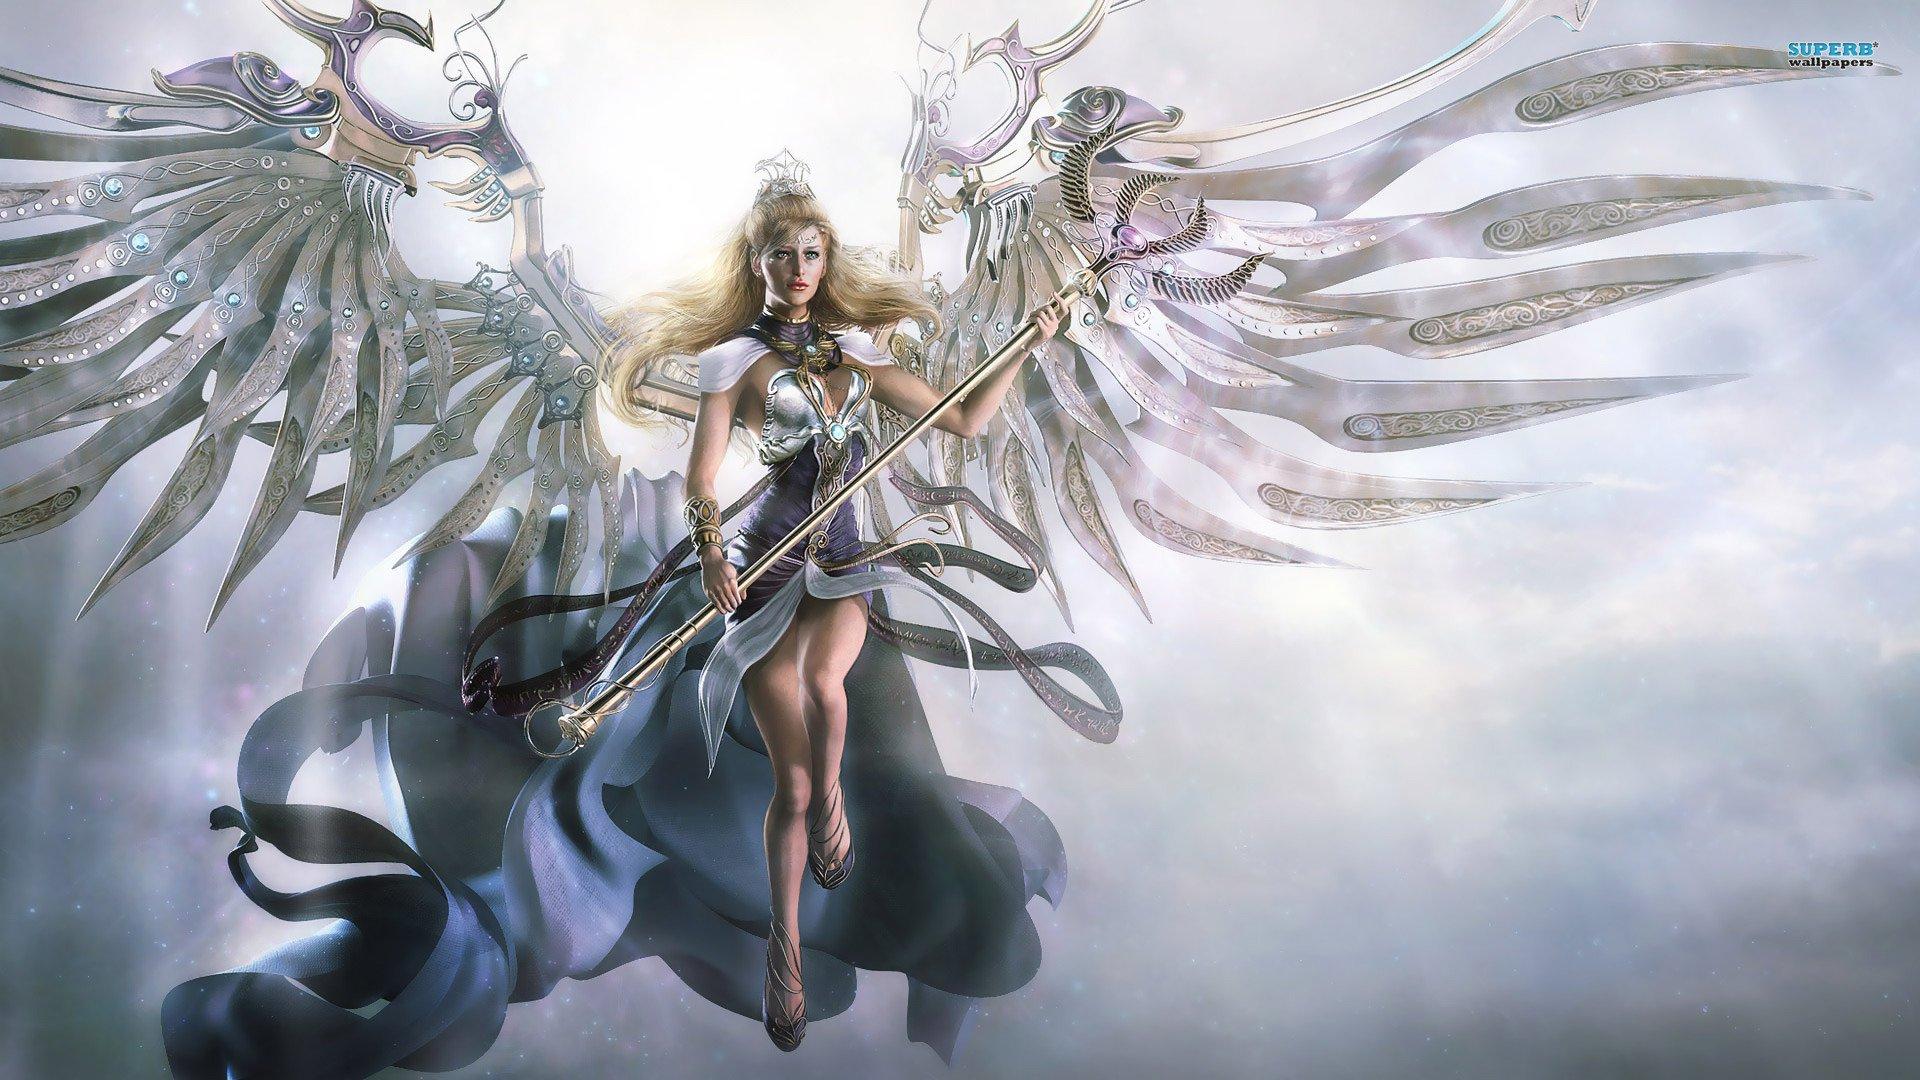 Angel warrior hd wallpaper background image 1920x1080 - Angel girl wallpaper ...